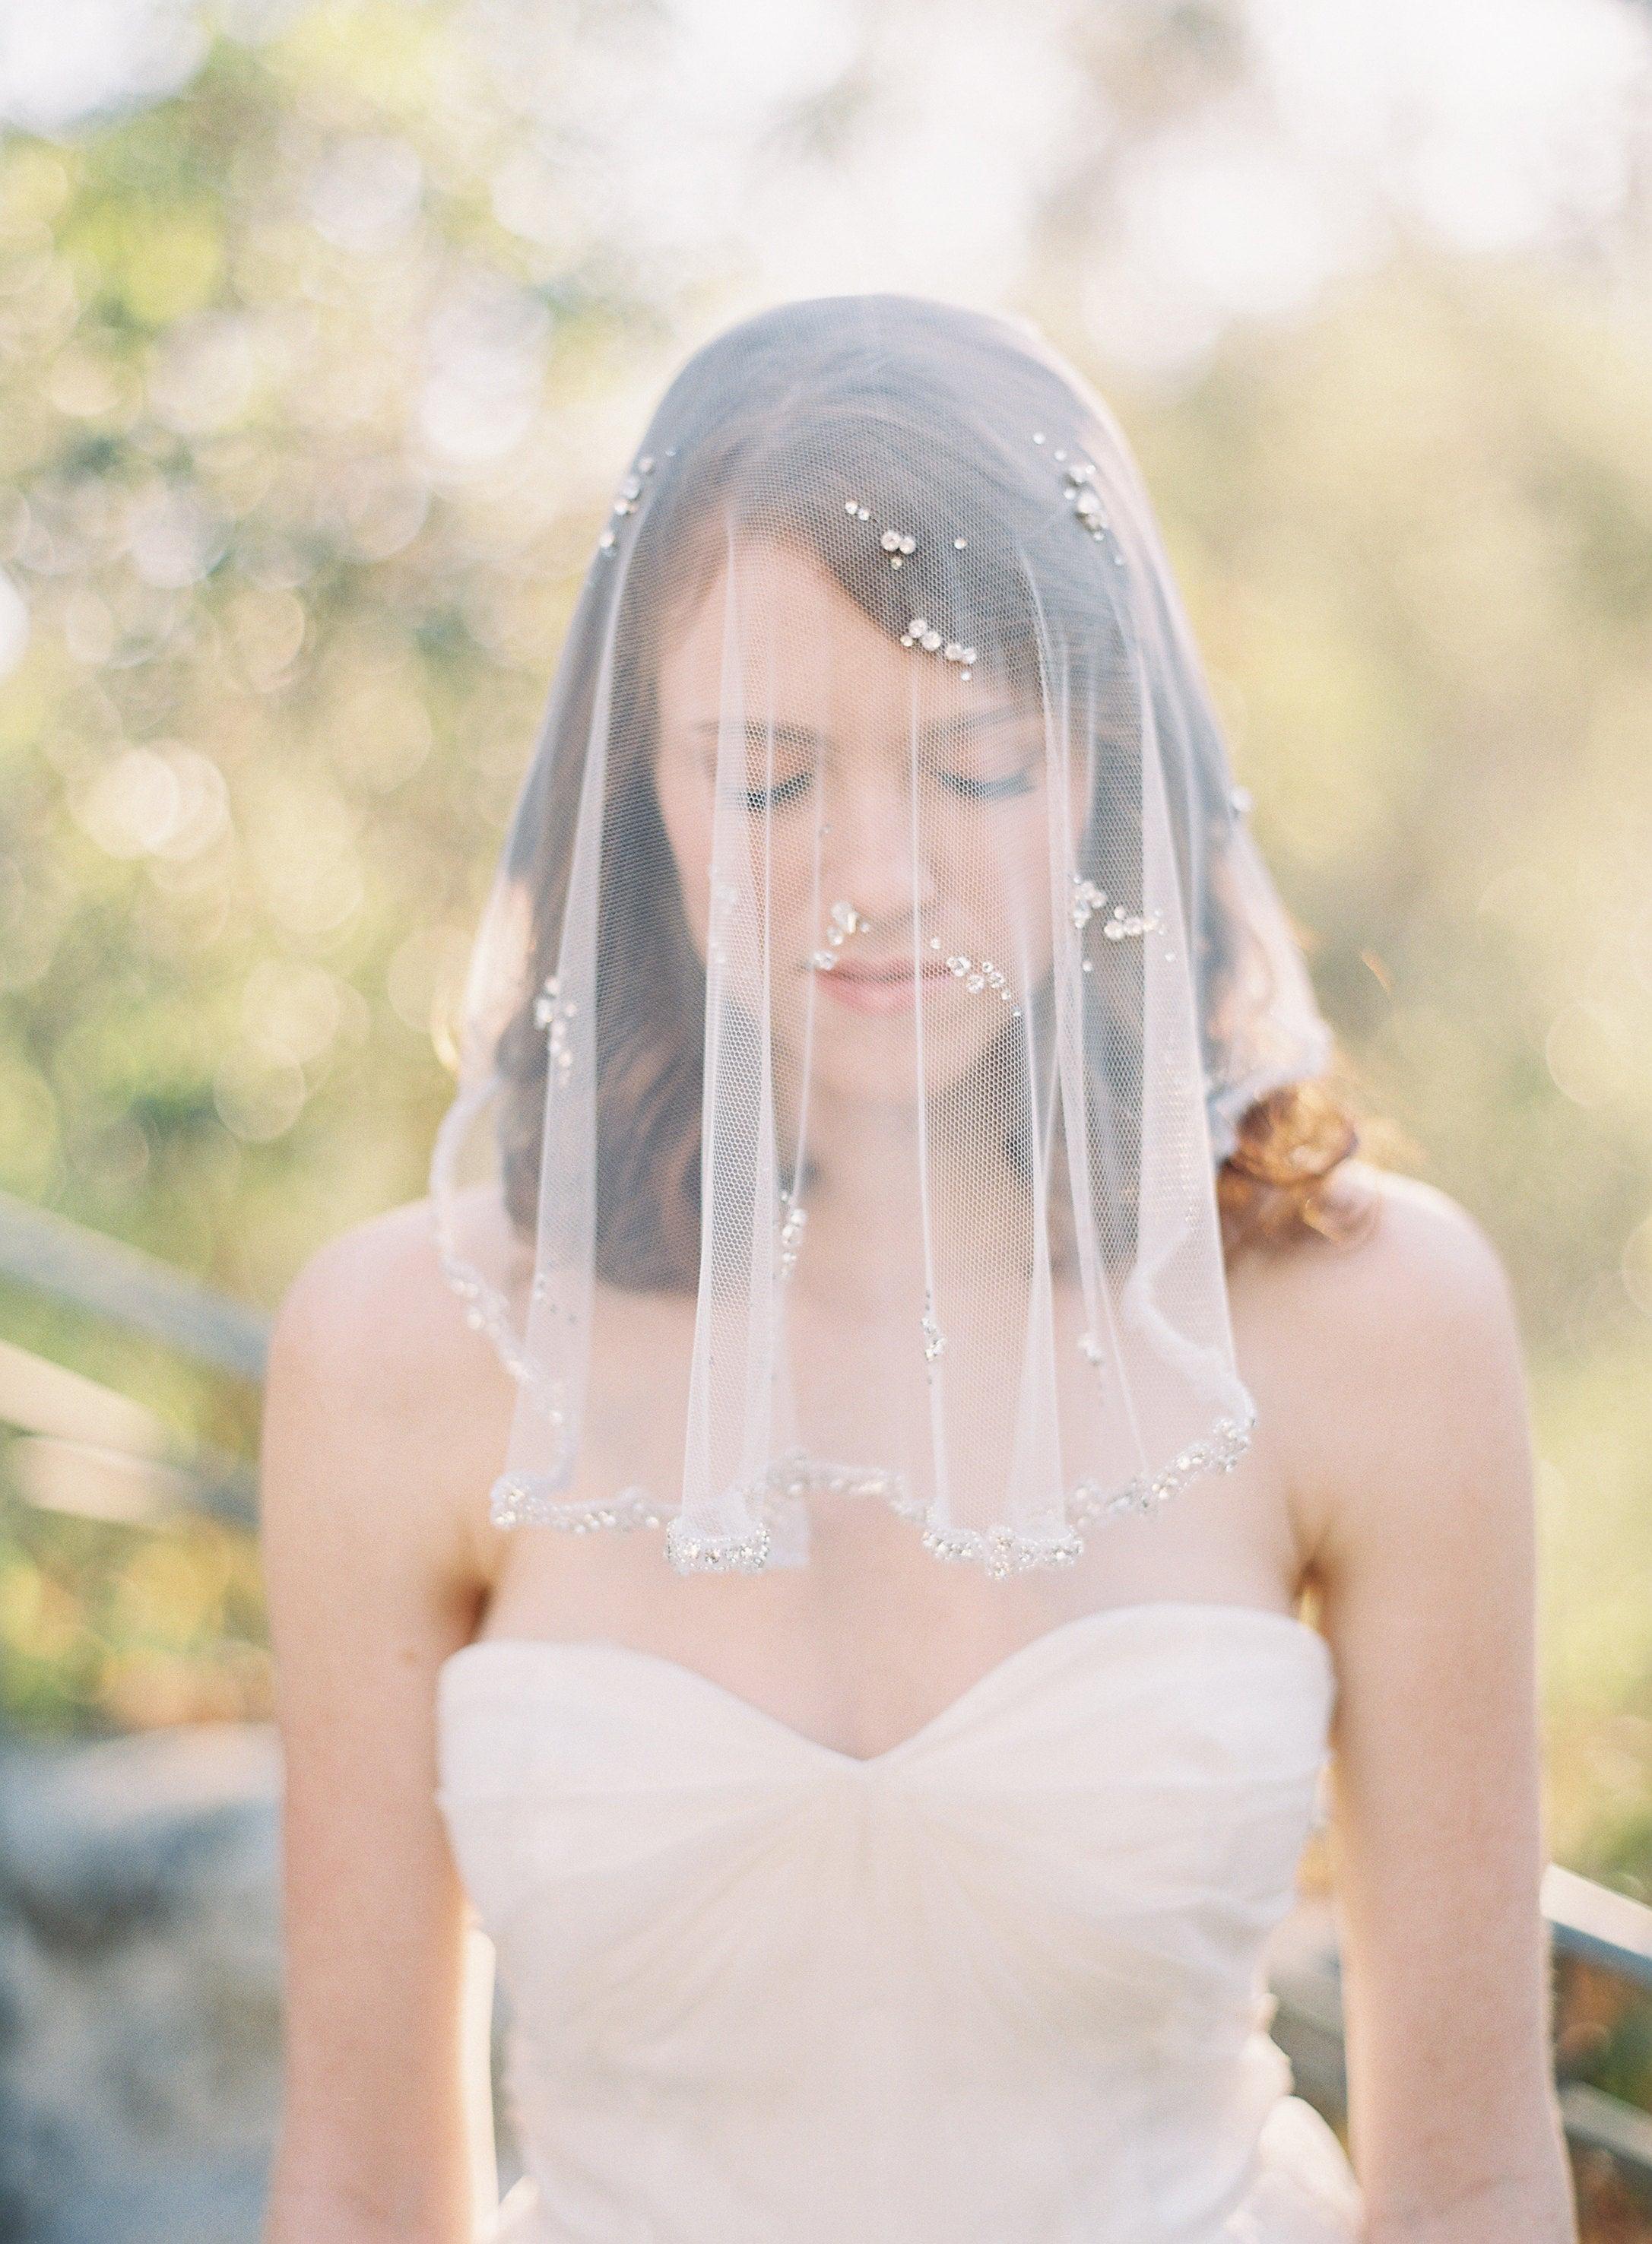 bride wearing short veil